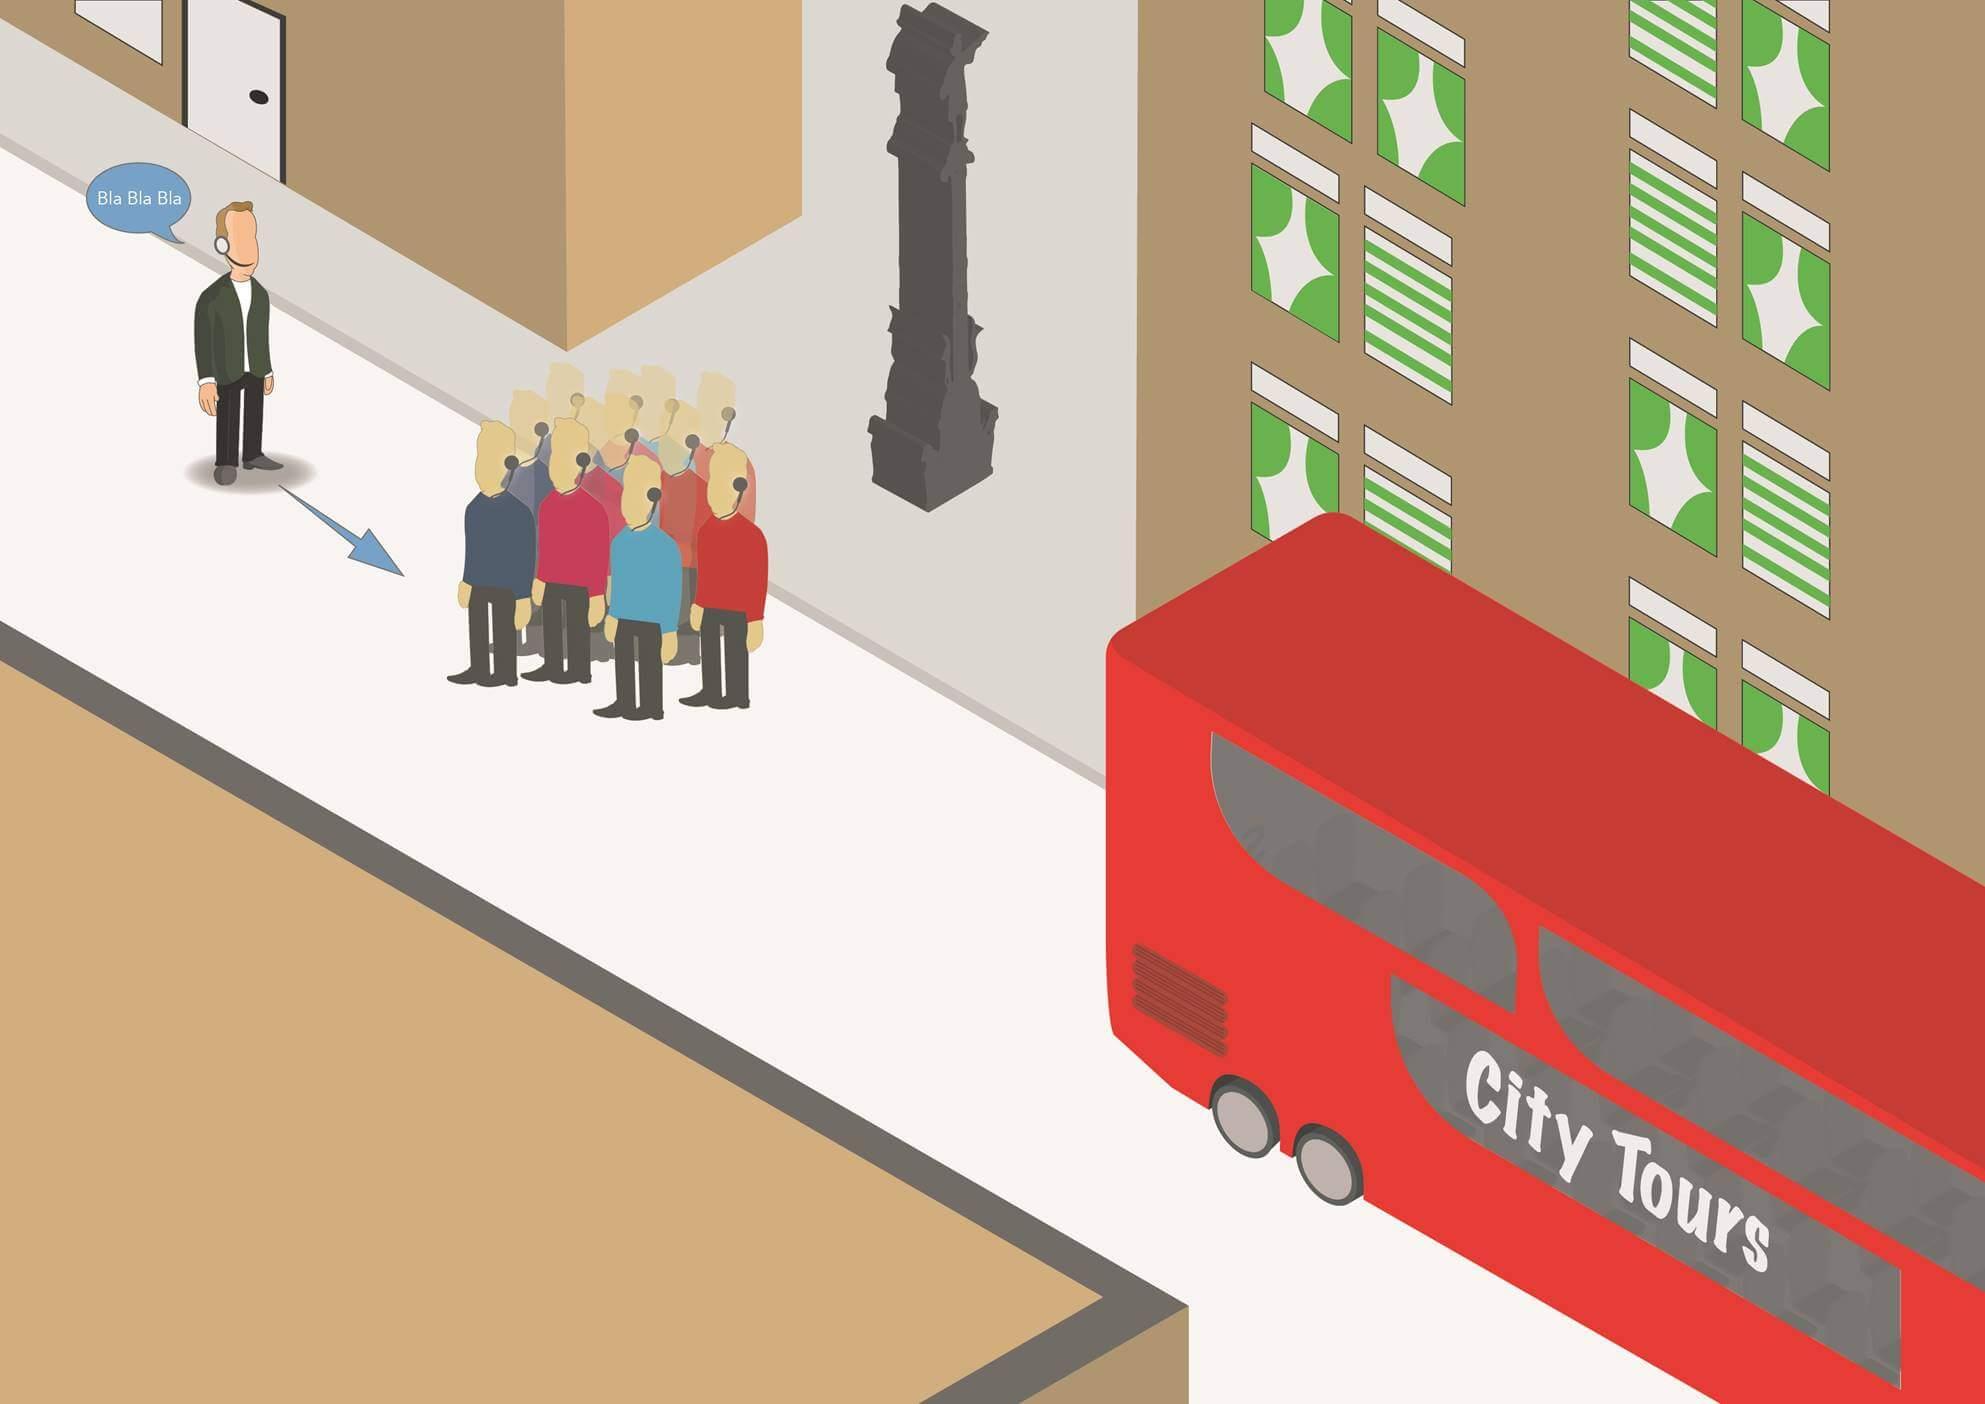 axitour-communication-systems-city-tours-city-walks-tour-guiding